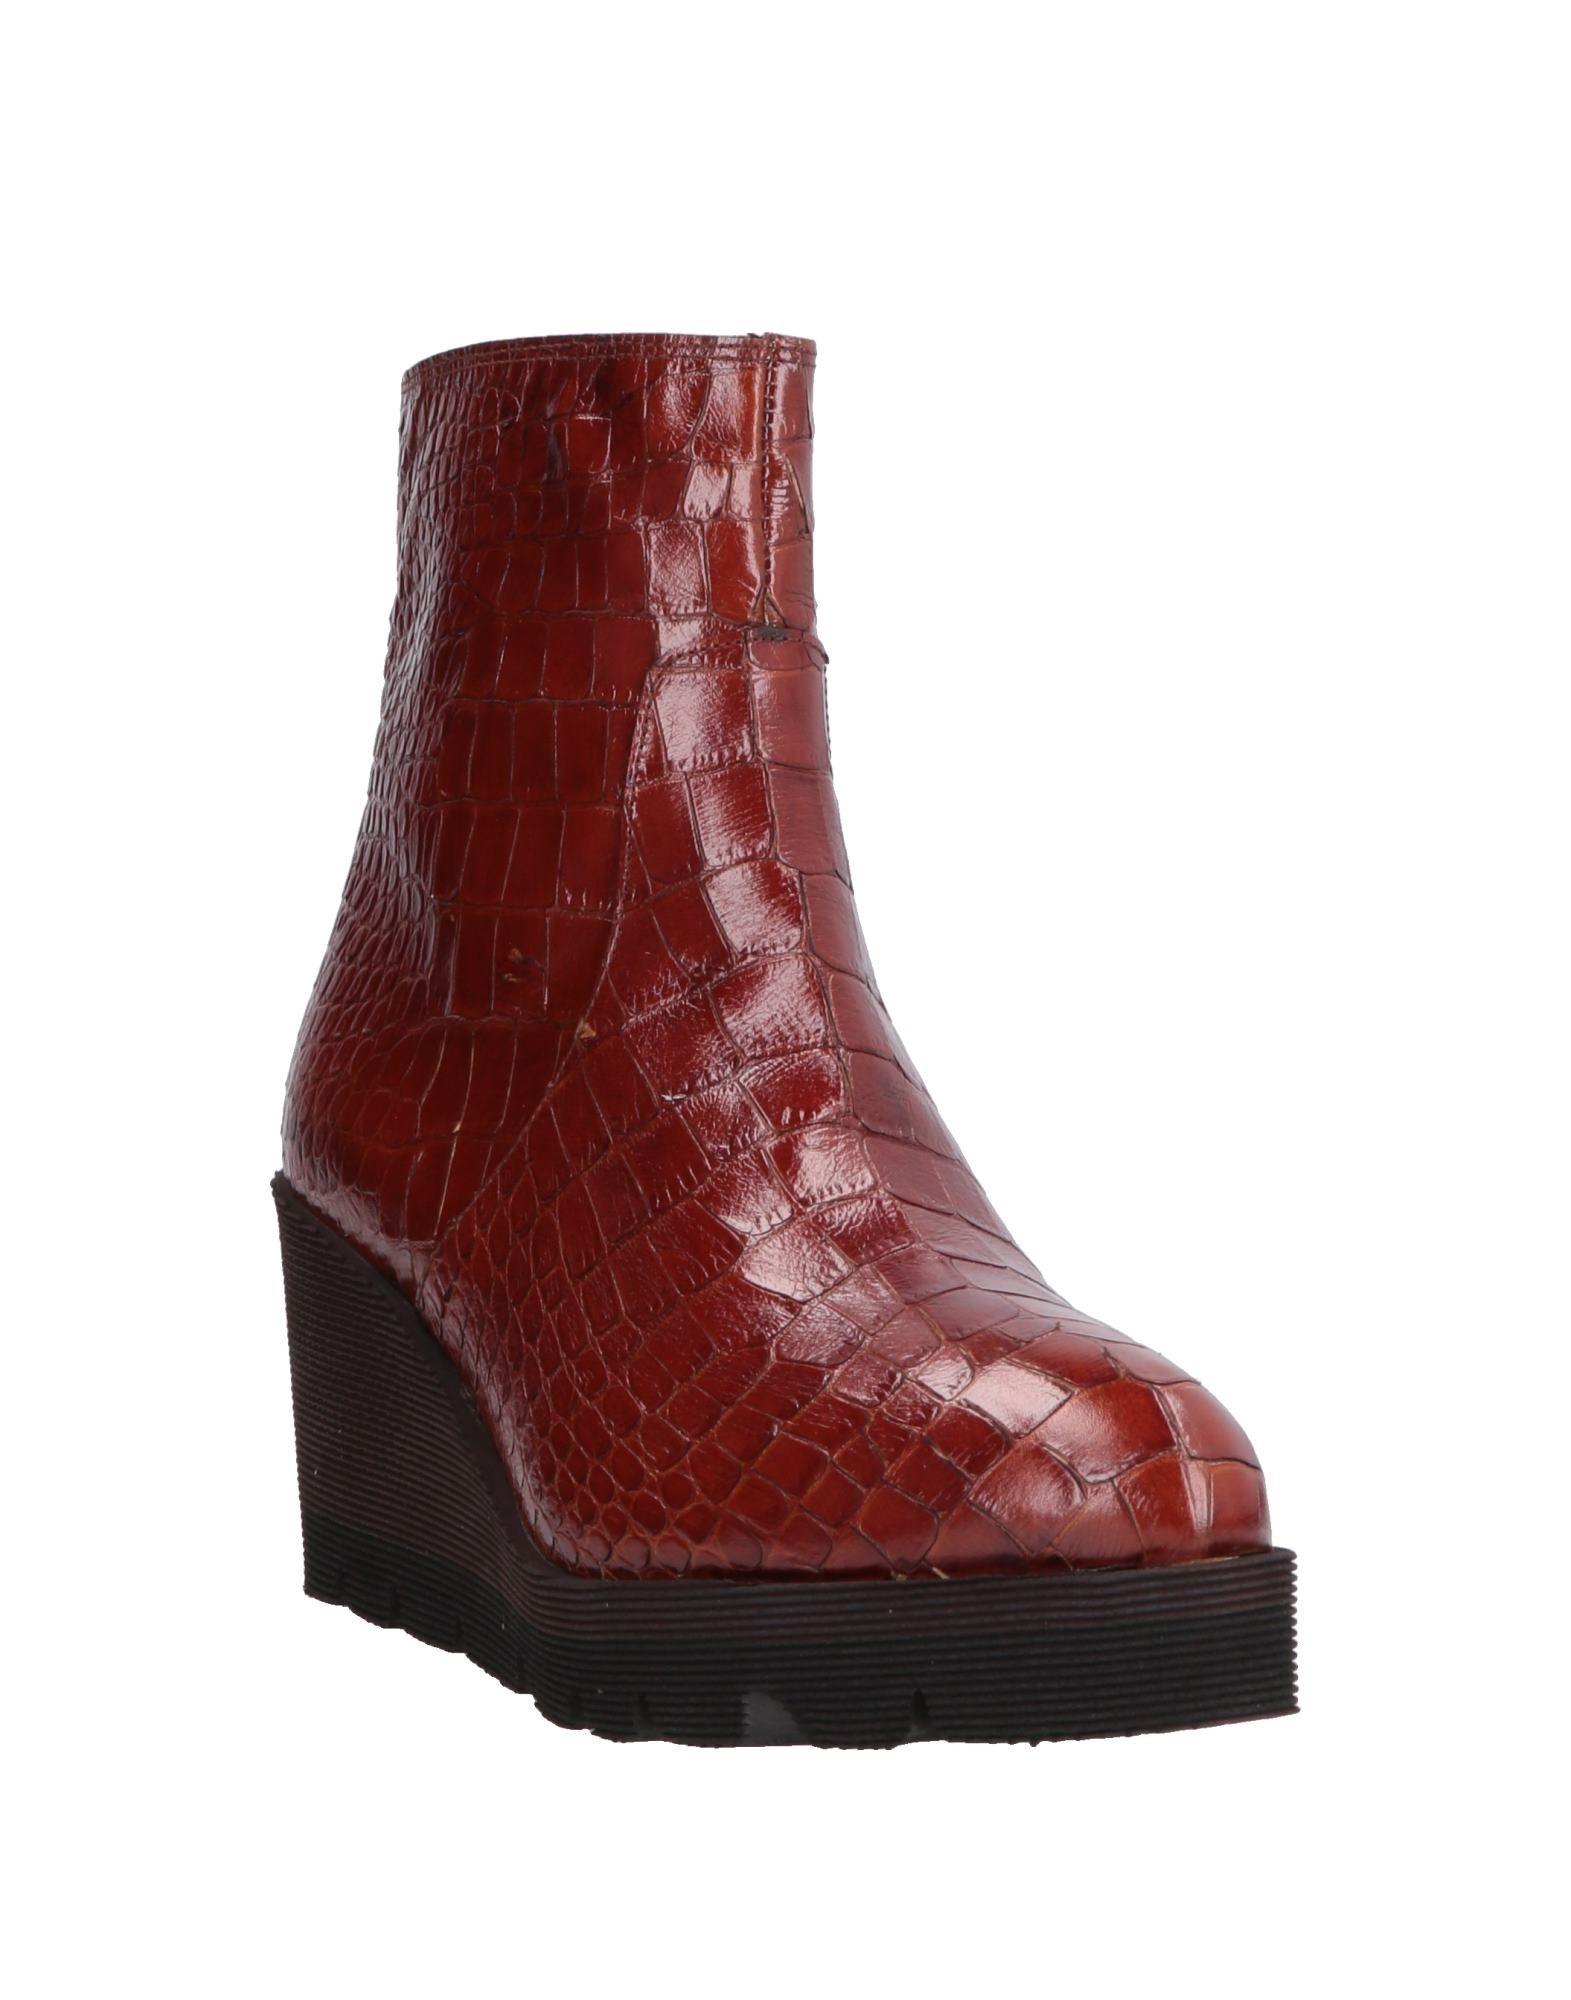 Stilvolle billige Schuhe Pons 11556376XK Quintana Stiefelette Damen  11556376XK Pons 5ded17